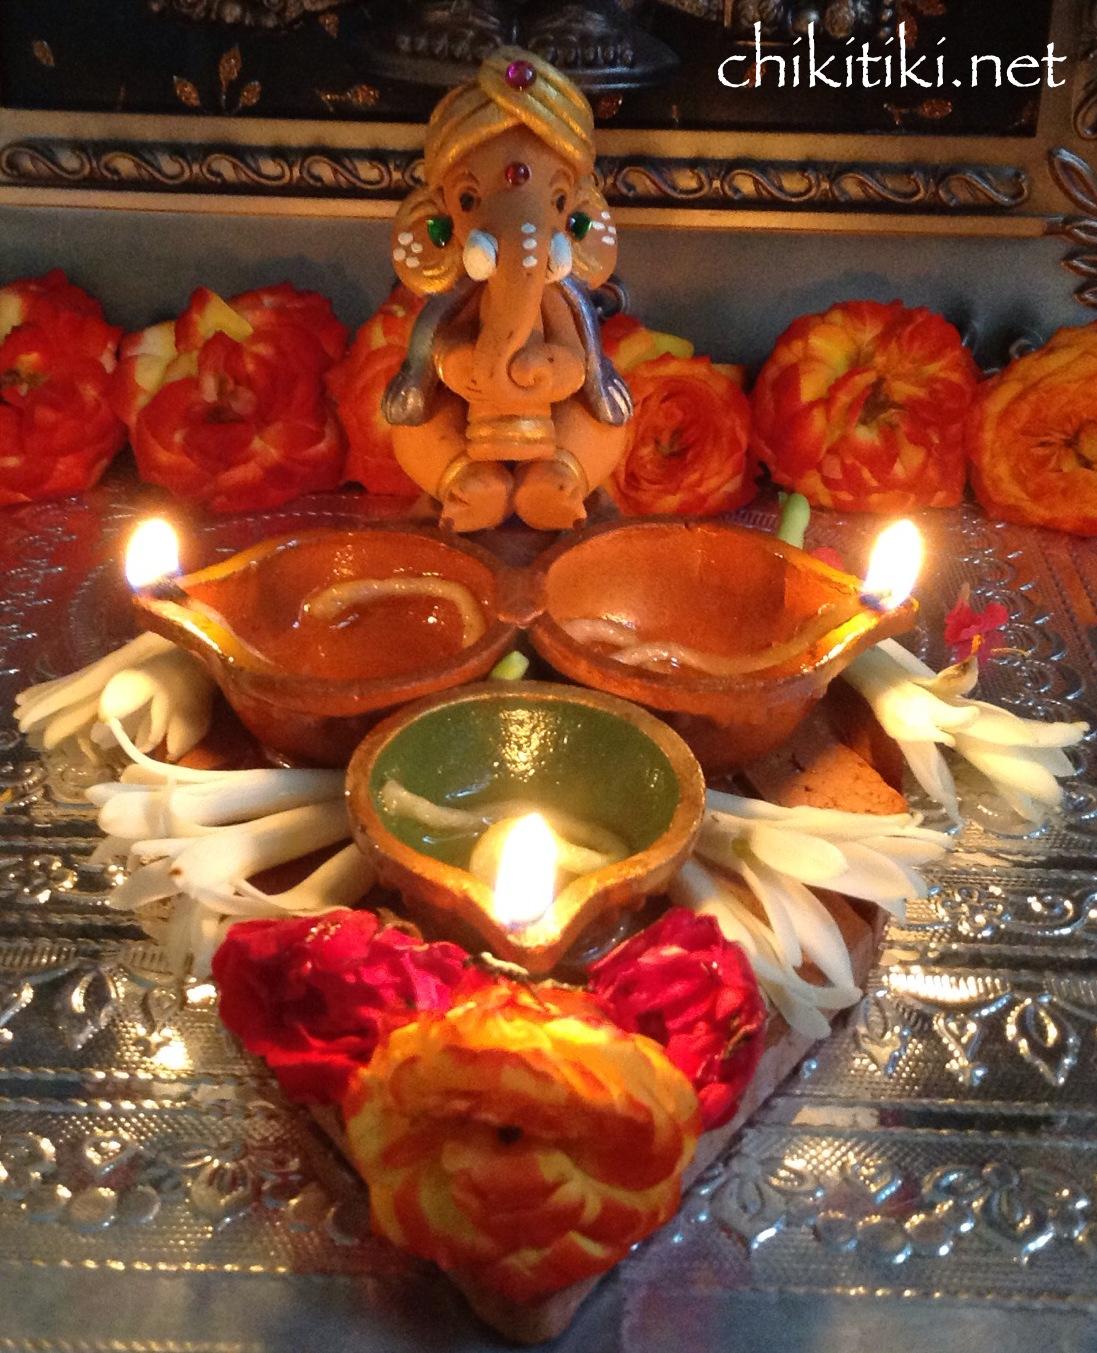 my favourite festival diwali Short essay on my favourite festival diwali in hindi, knowledge is power essay in english, essay on recent earthquake in.